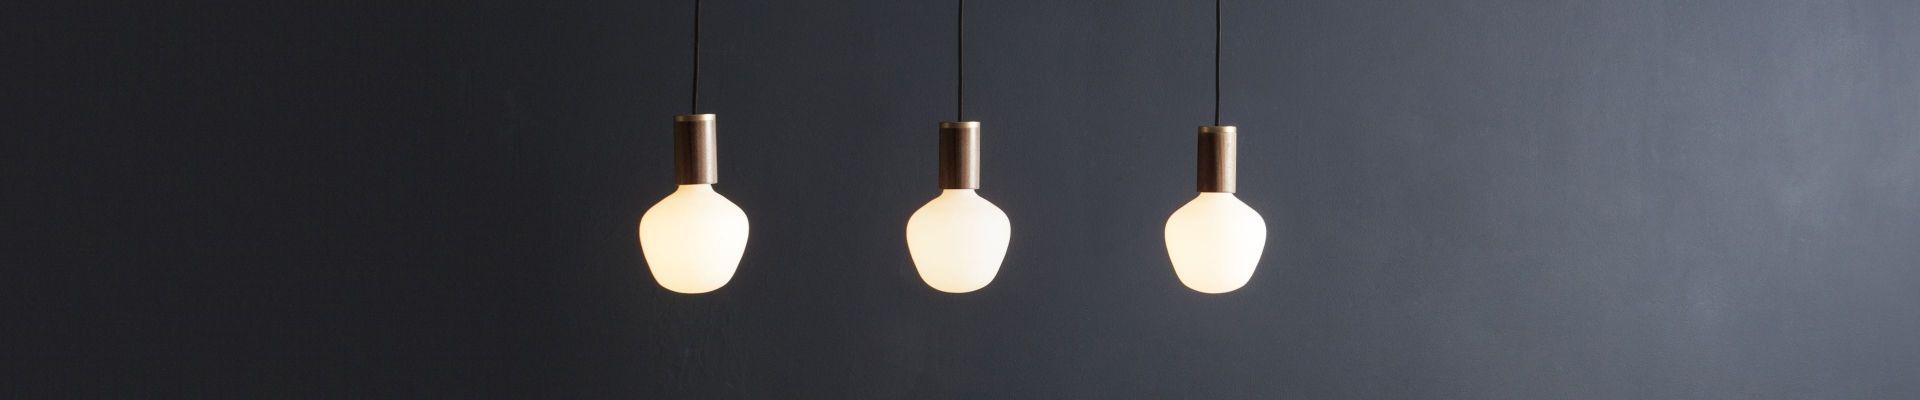 Tala LED Light Engine